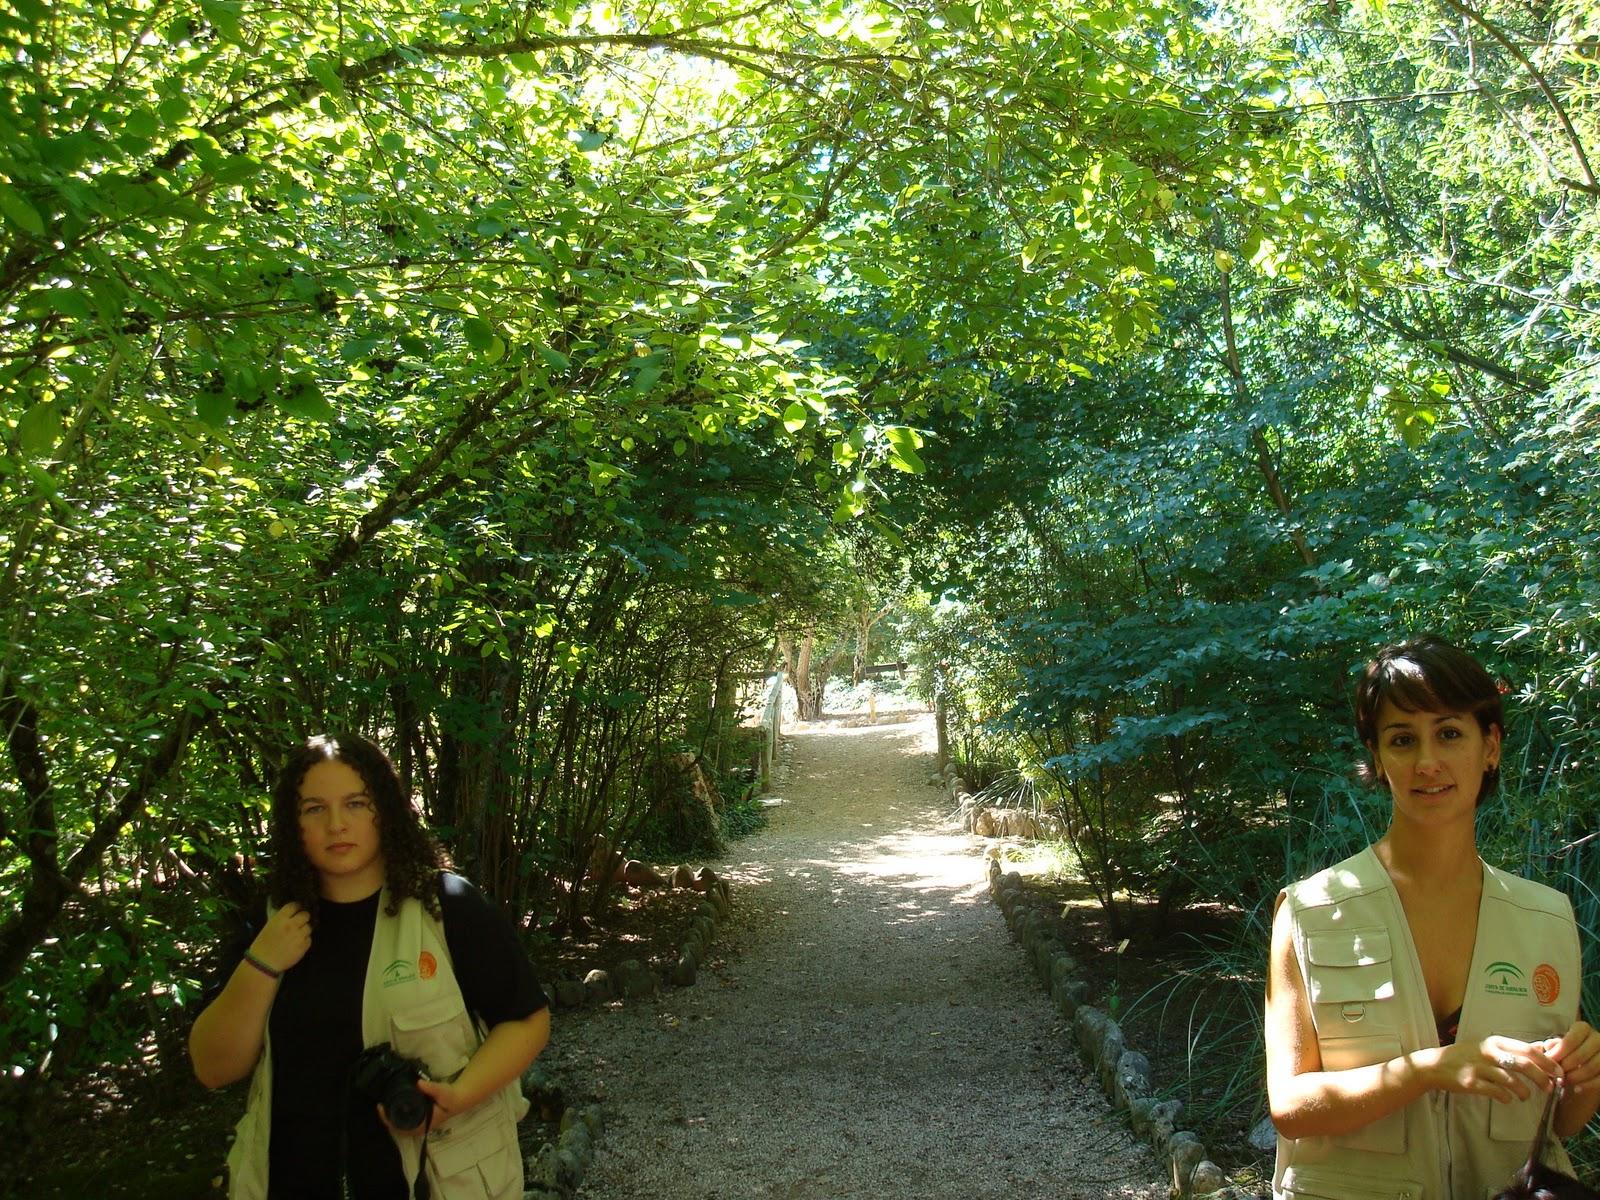 El rinc n del sherpa jardines bot nicos de andaluc a - Jardines de andalucia ...